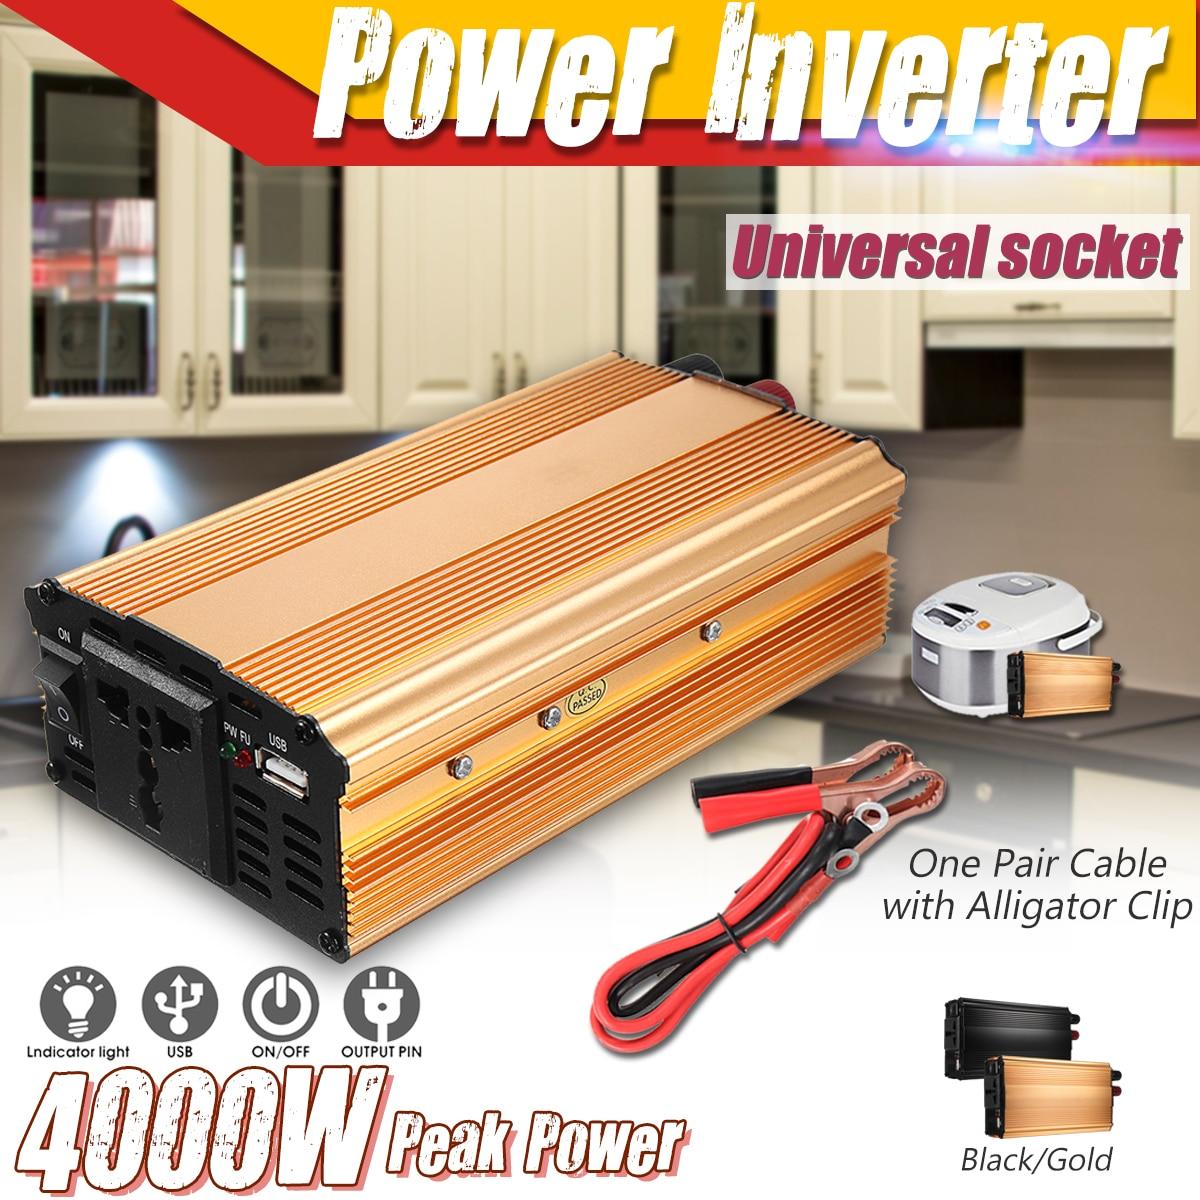 Inversor 12V 24V 220V 4000W pico inversor de corriente del coche transformador de voltaje convertidor 12 220 Cargador Solar inversor 12V 220V 1 macho